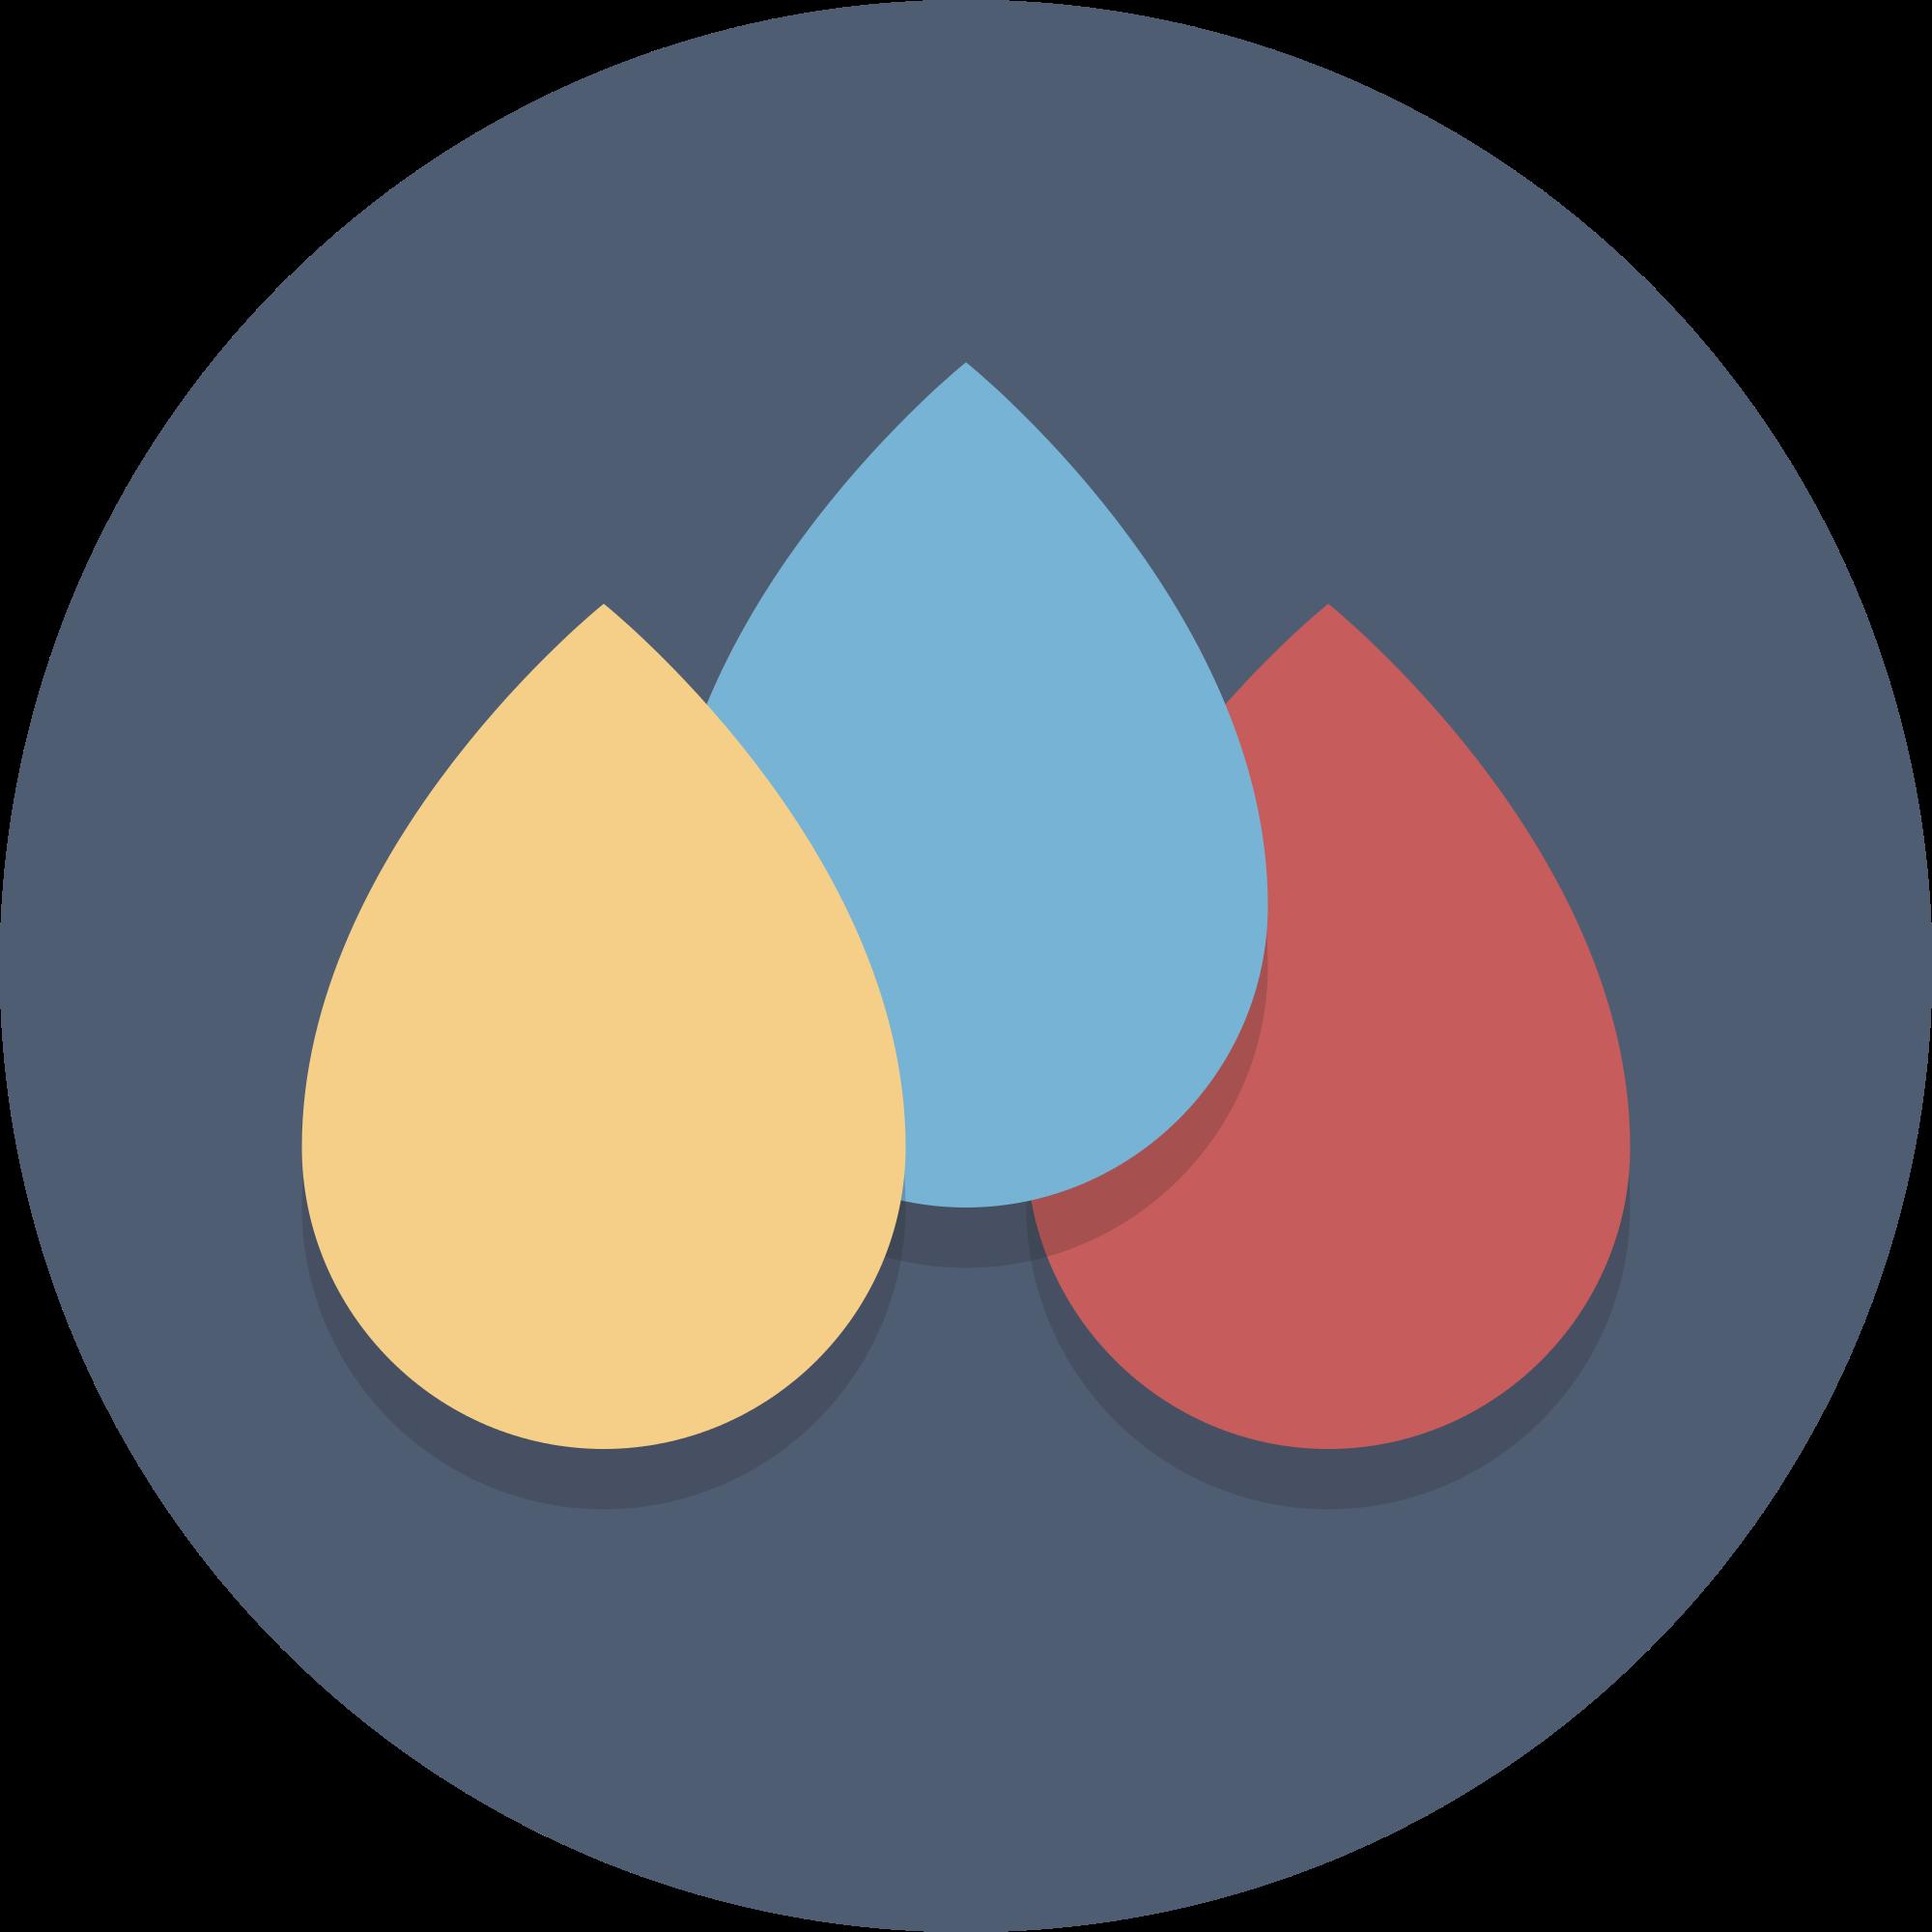 themes-flat-icon